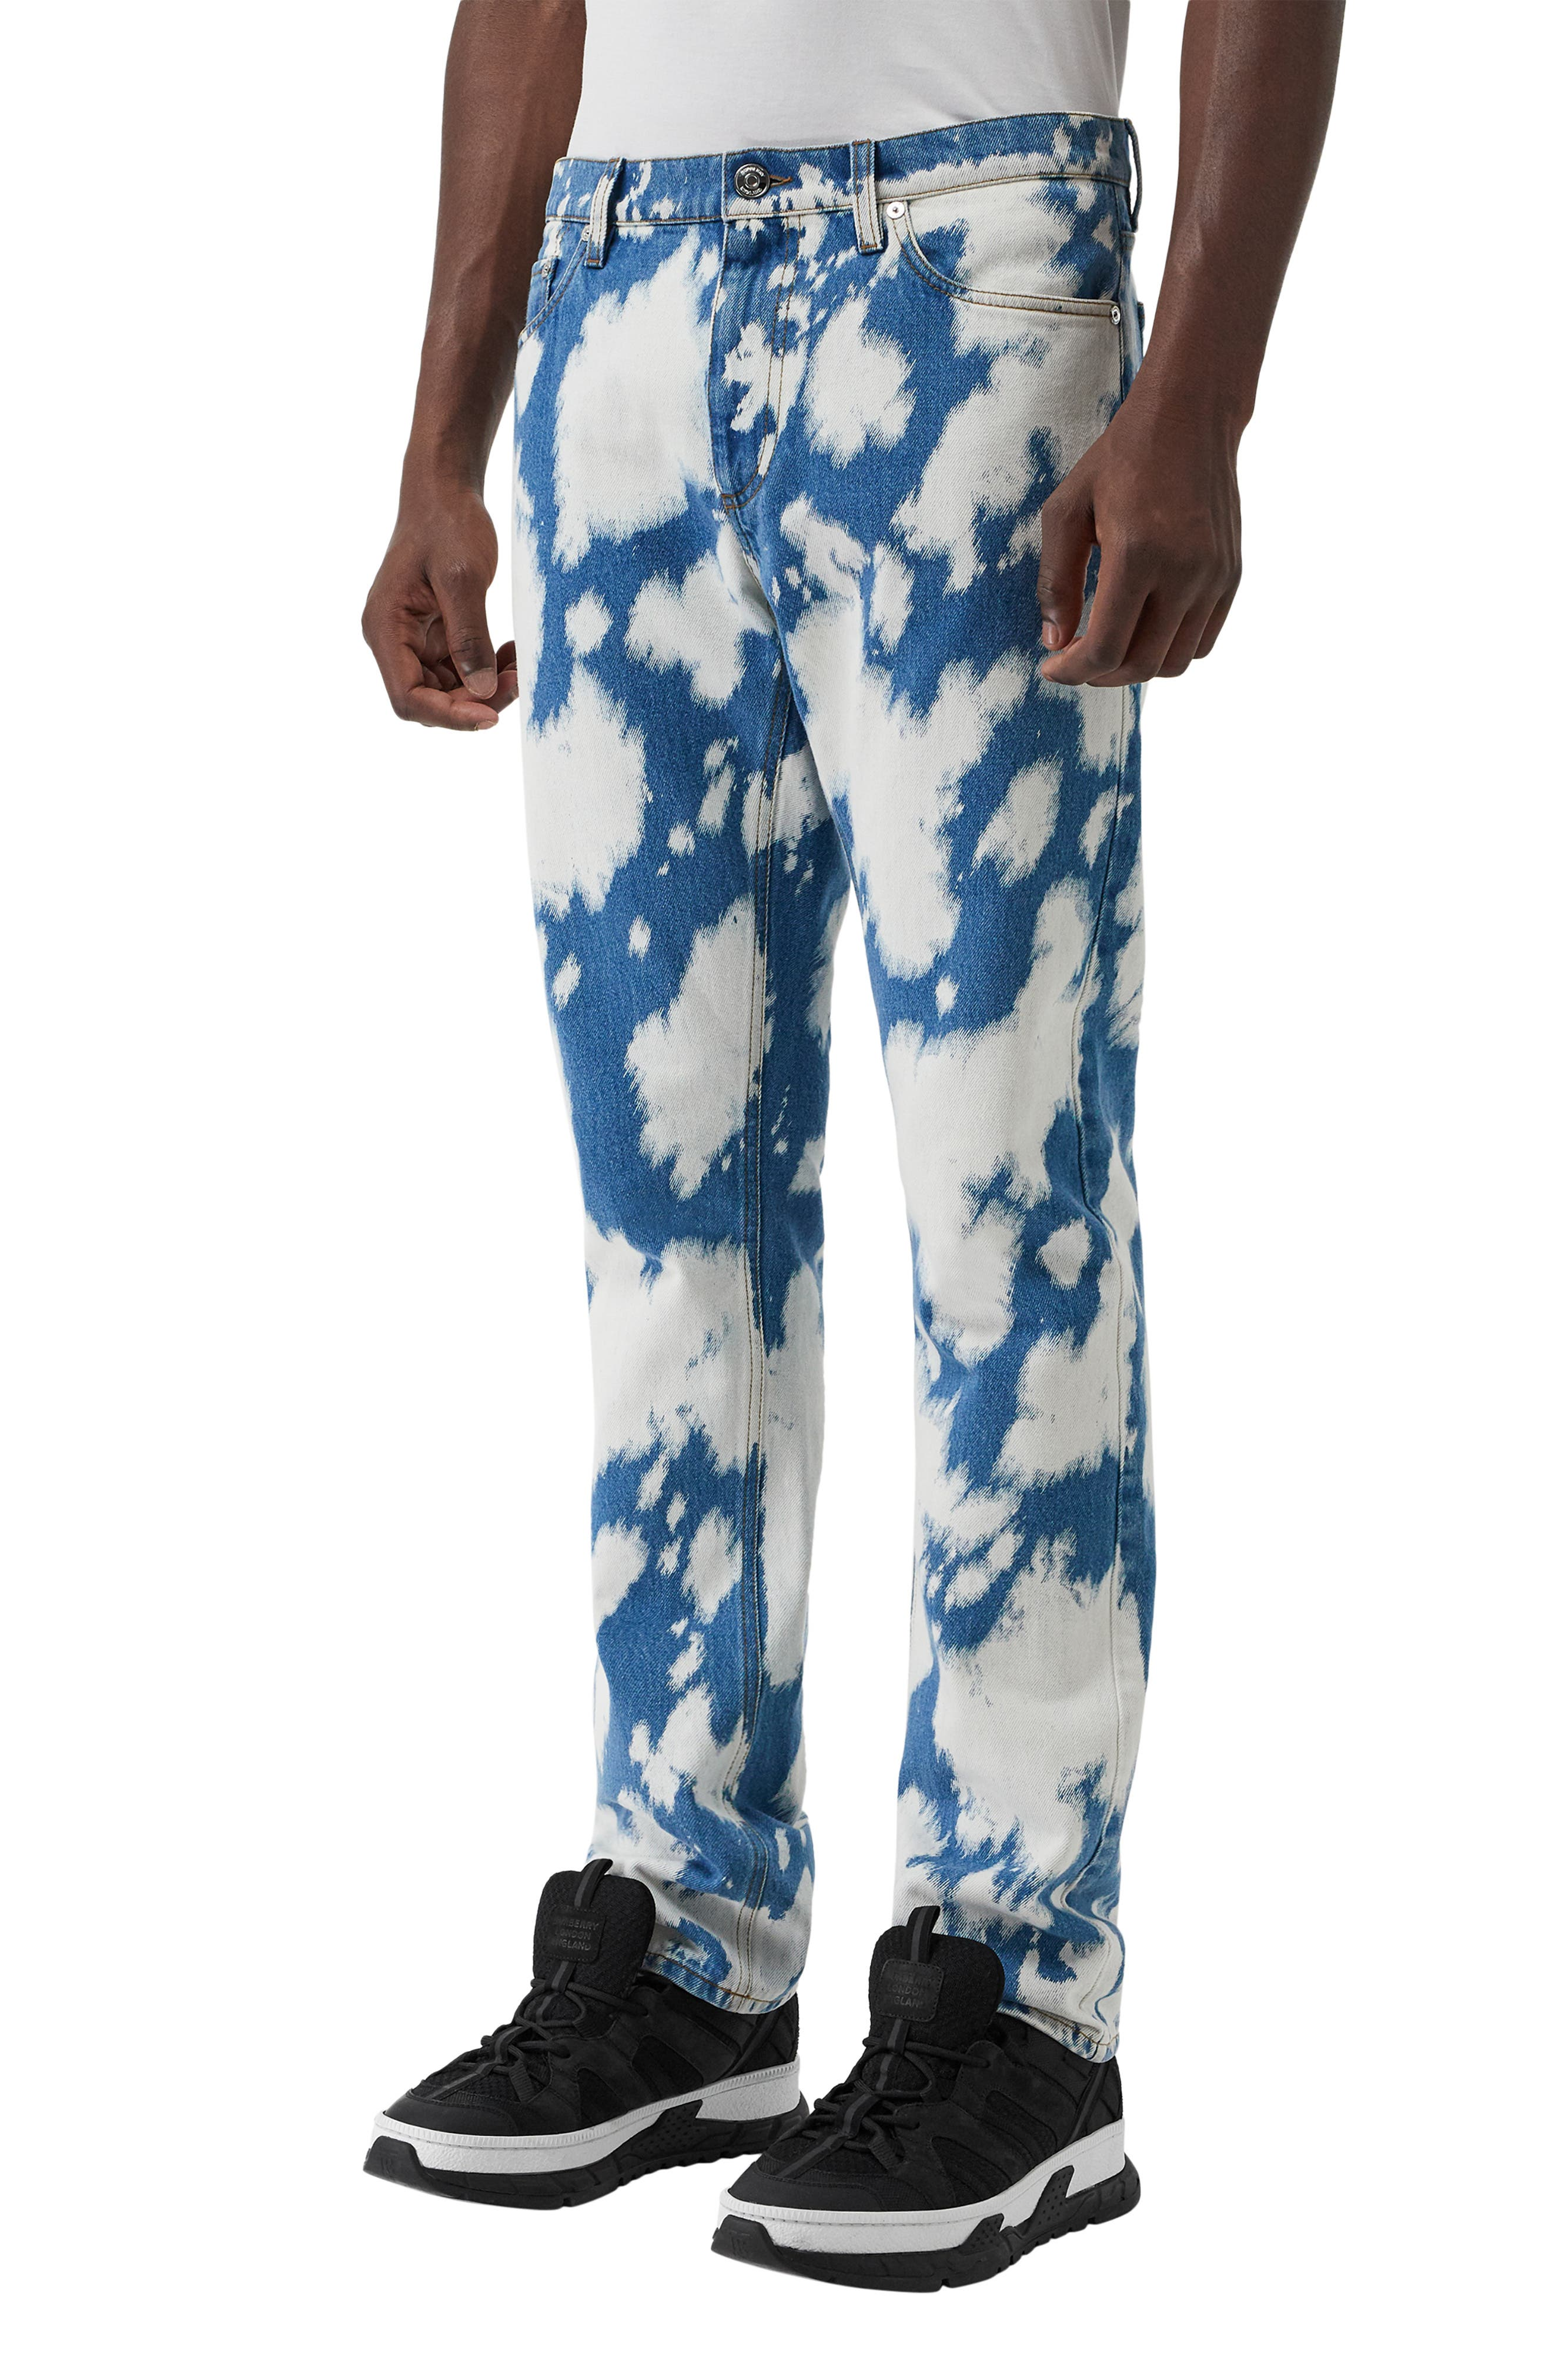 BURBERRY, Punk Bleached Straight Leg Jeans, Alternate thumbnail 3, color, LIGHT INDIGO